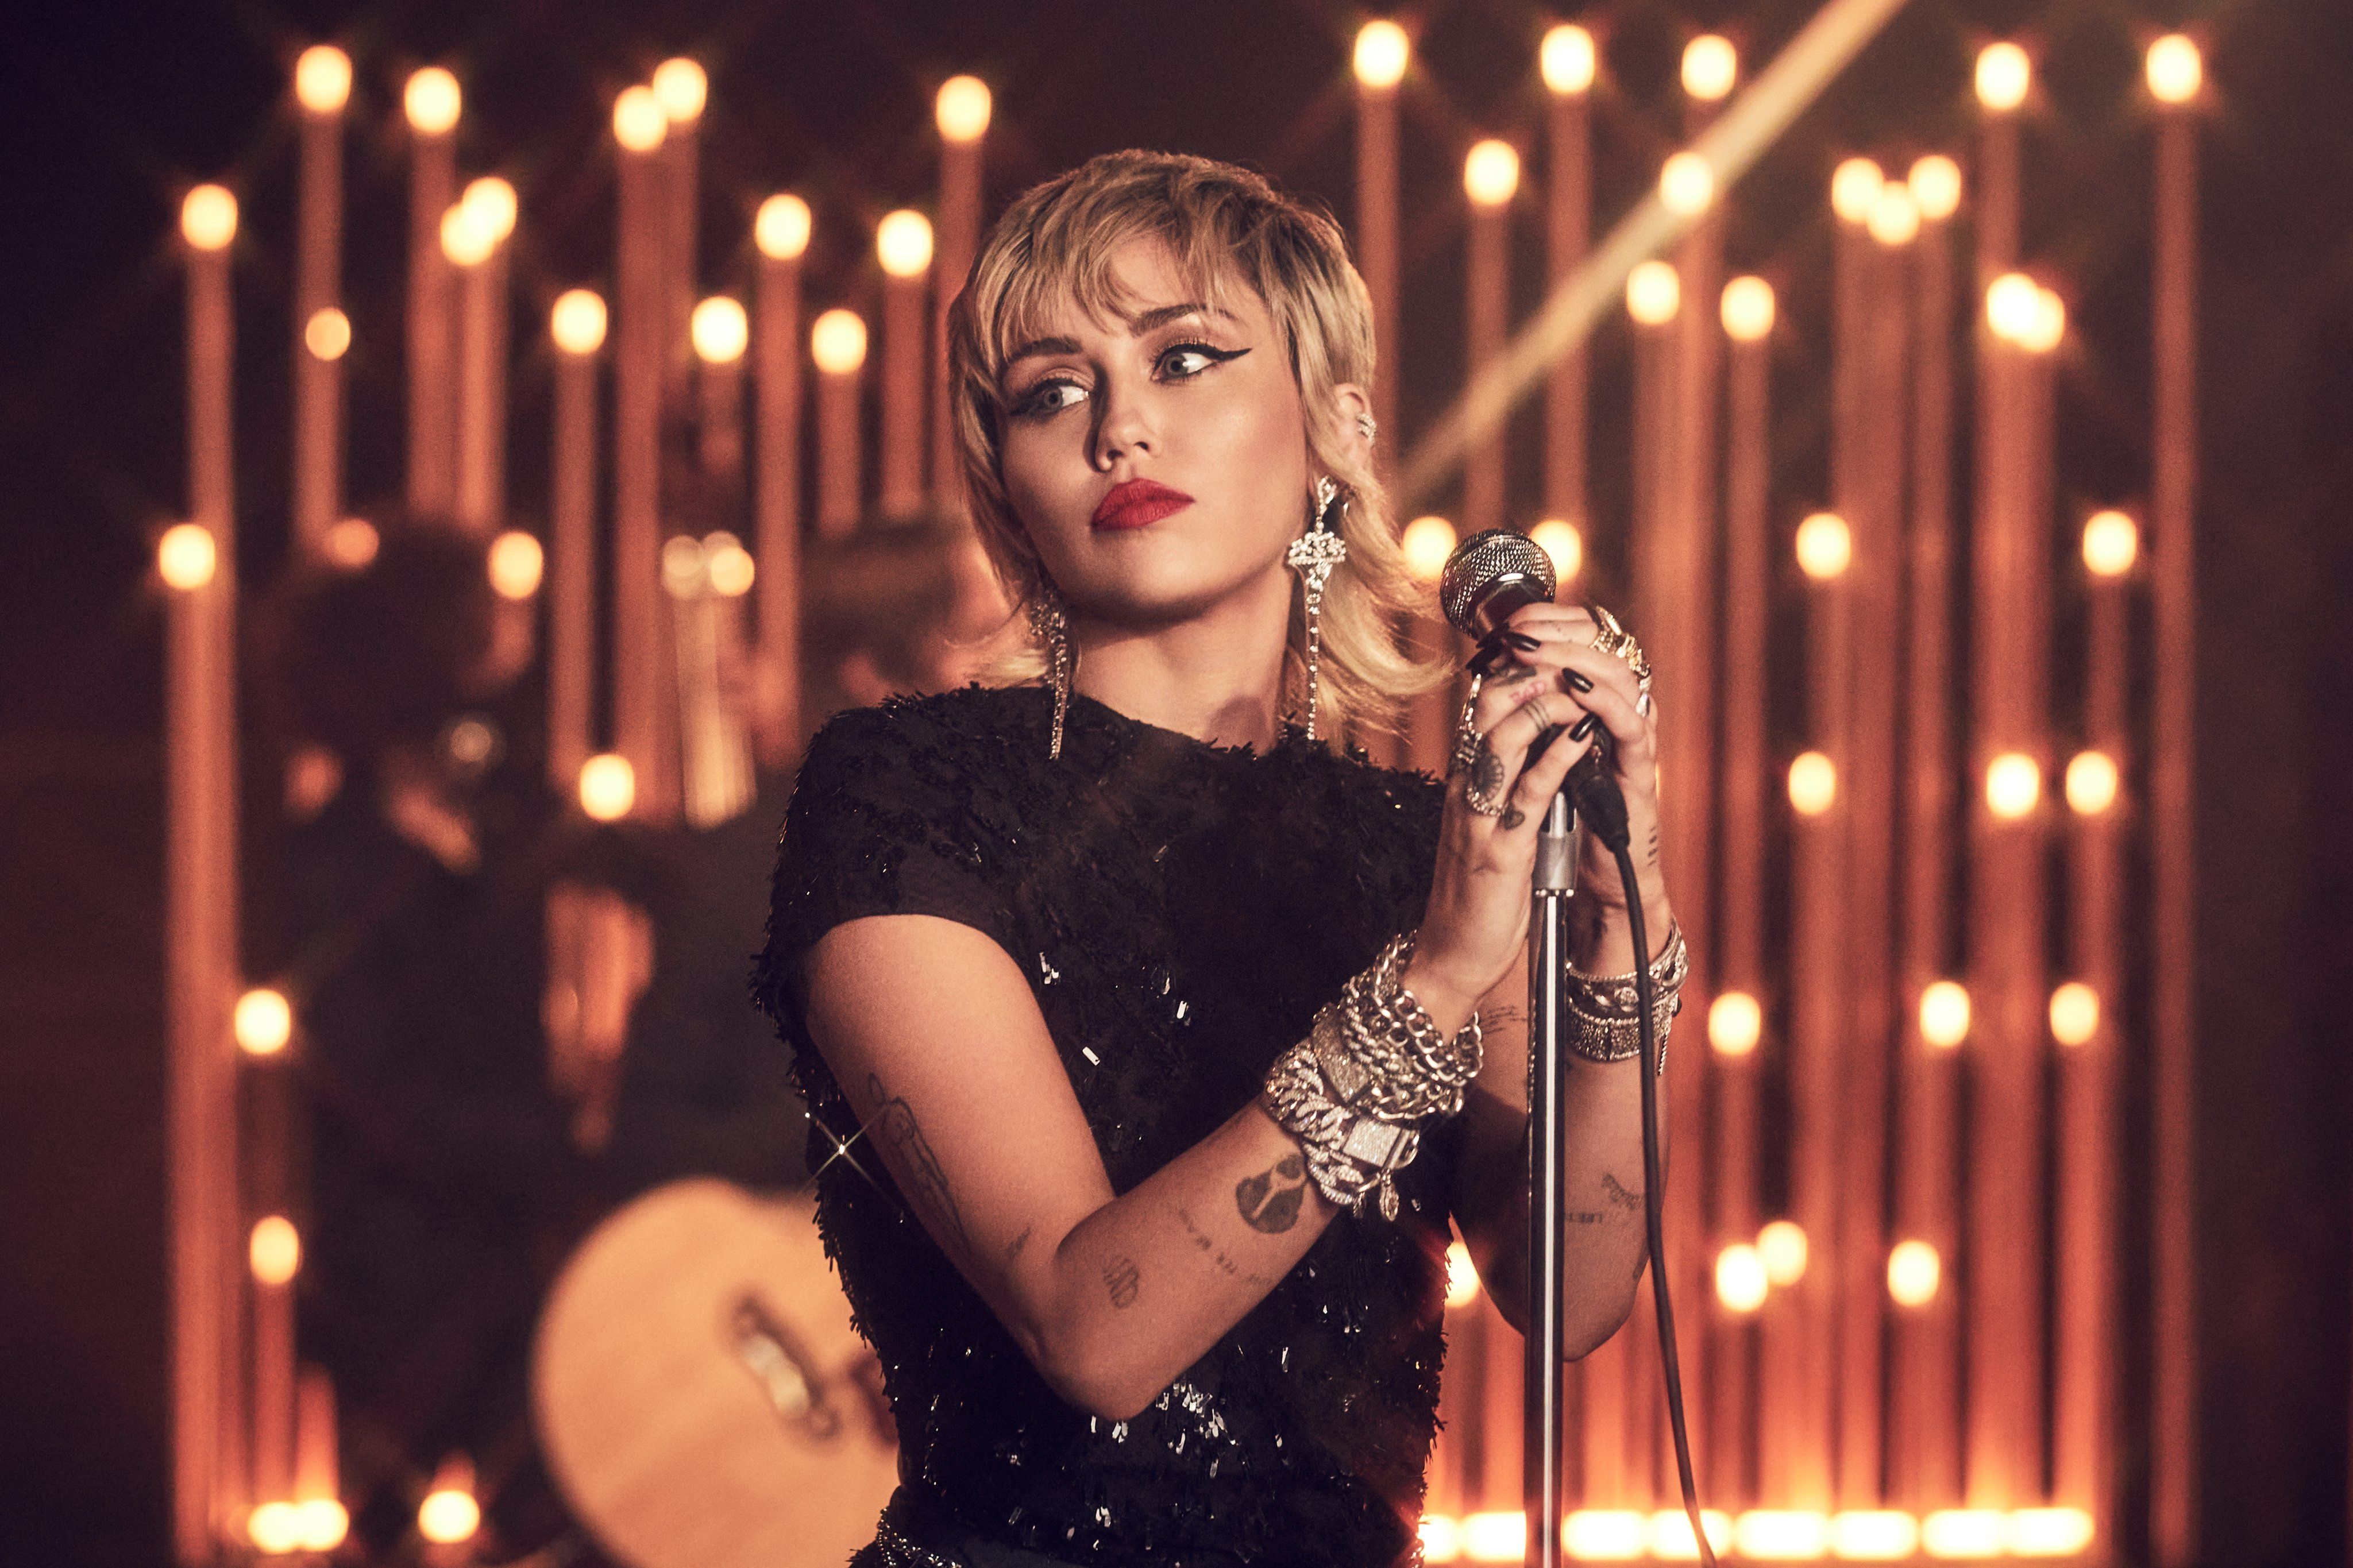 Miley Cyrus covers Billie Eilish's 'my future'